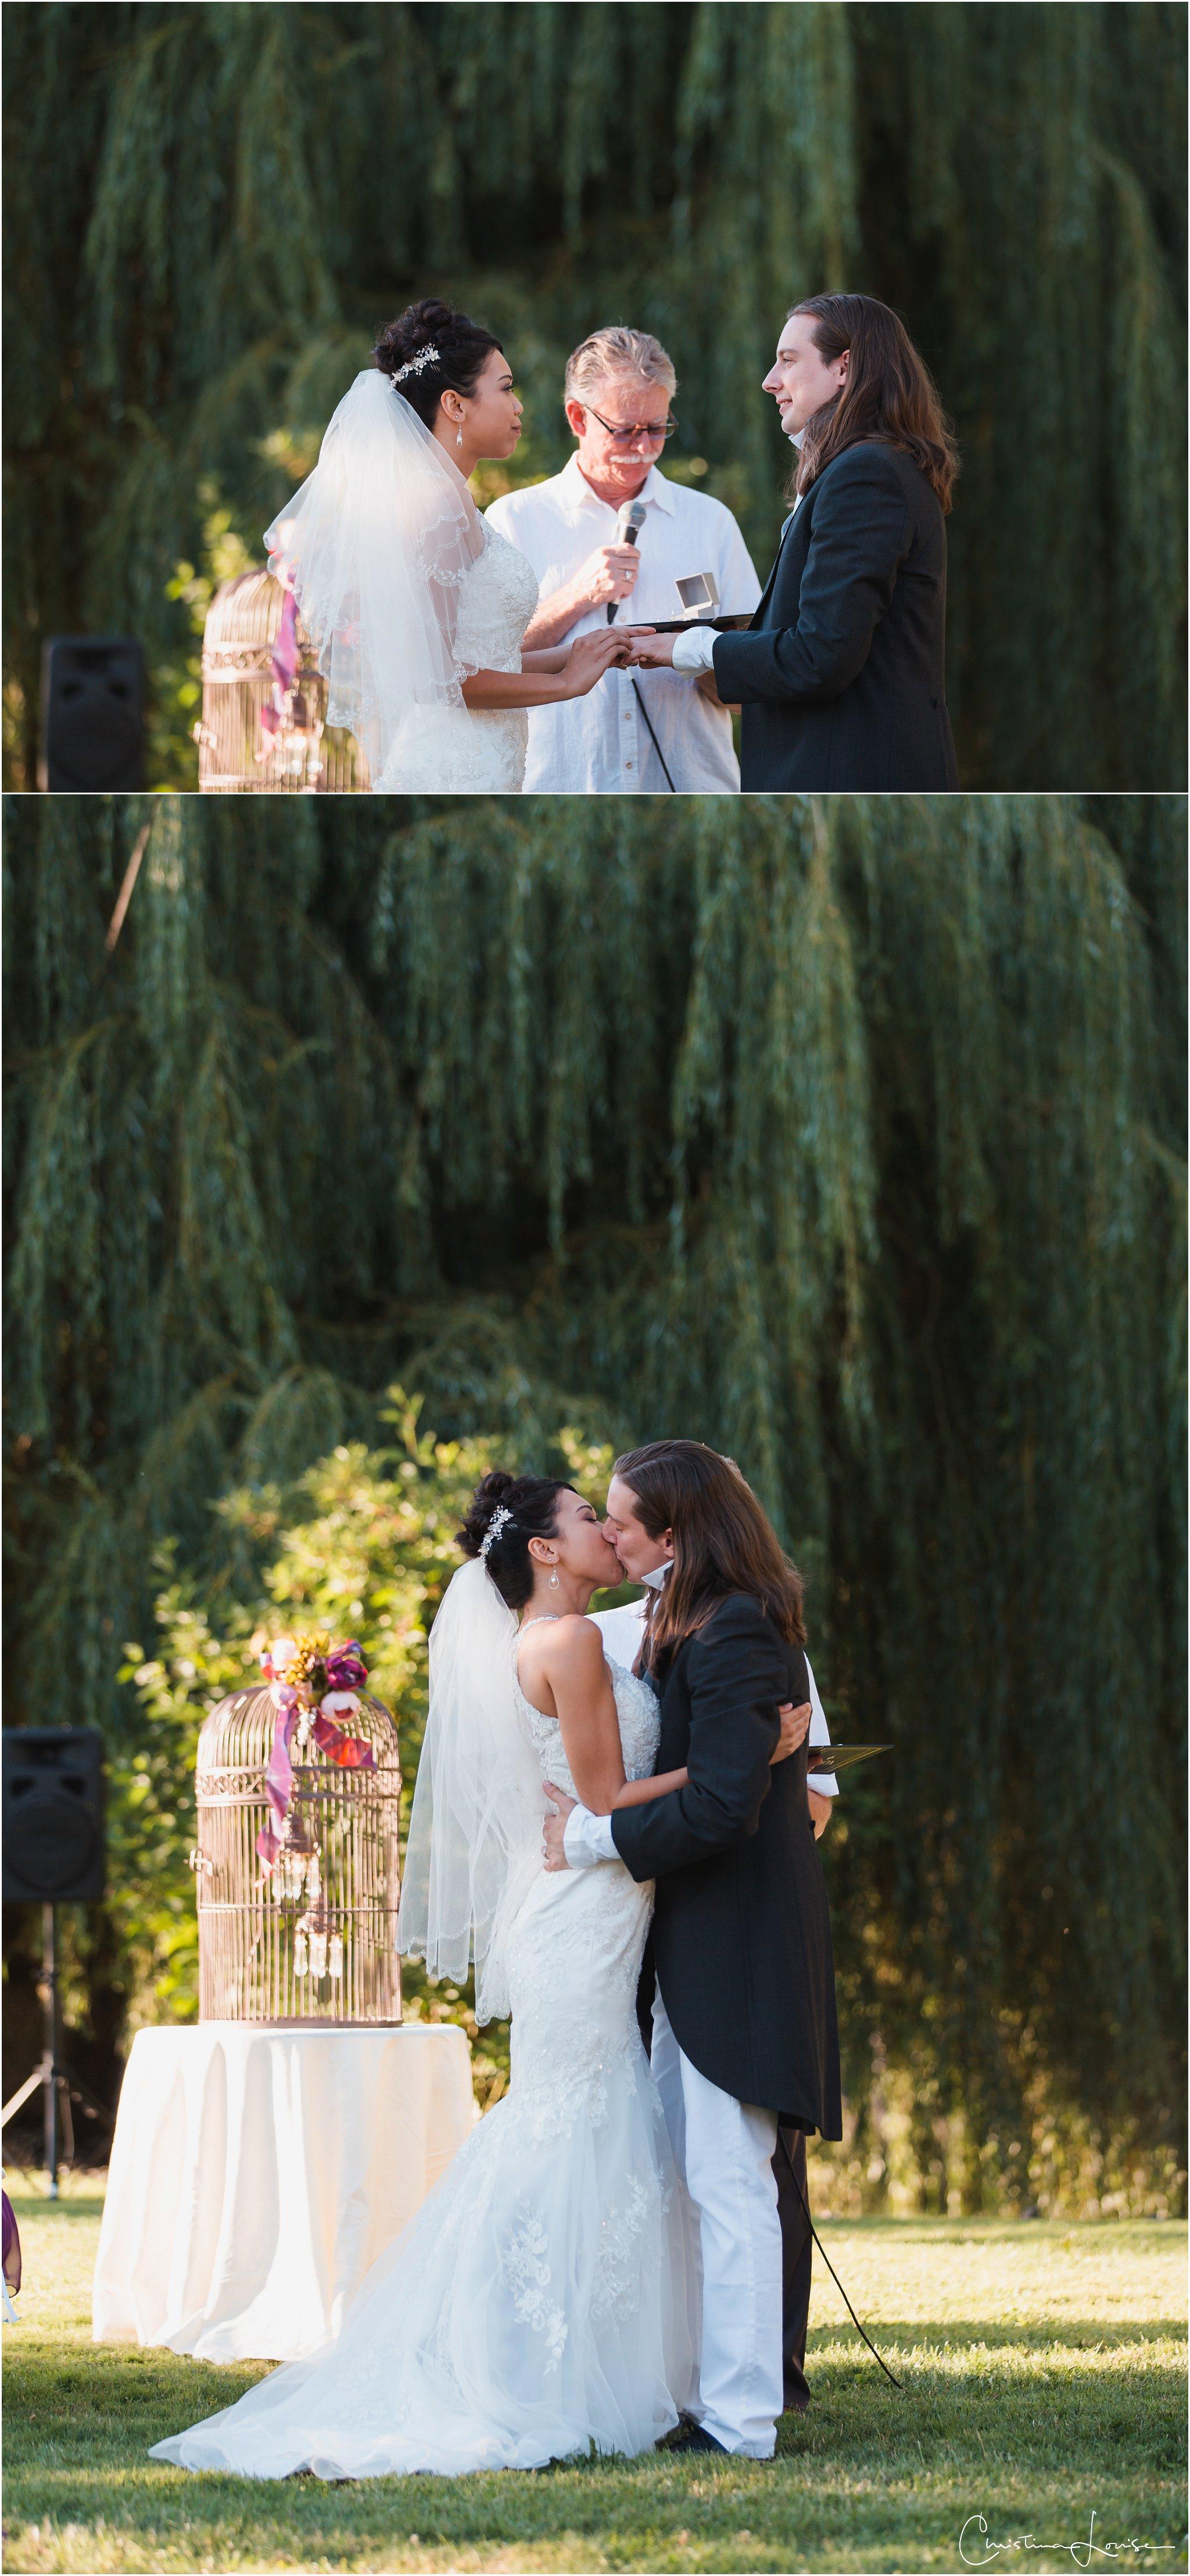 married_first_kiss.jpg